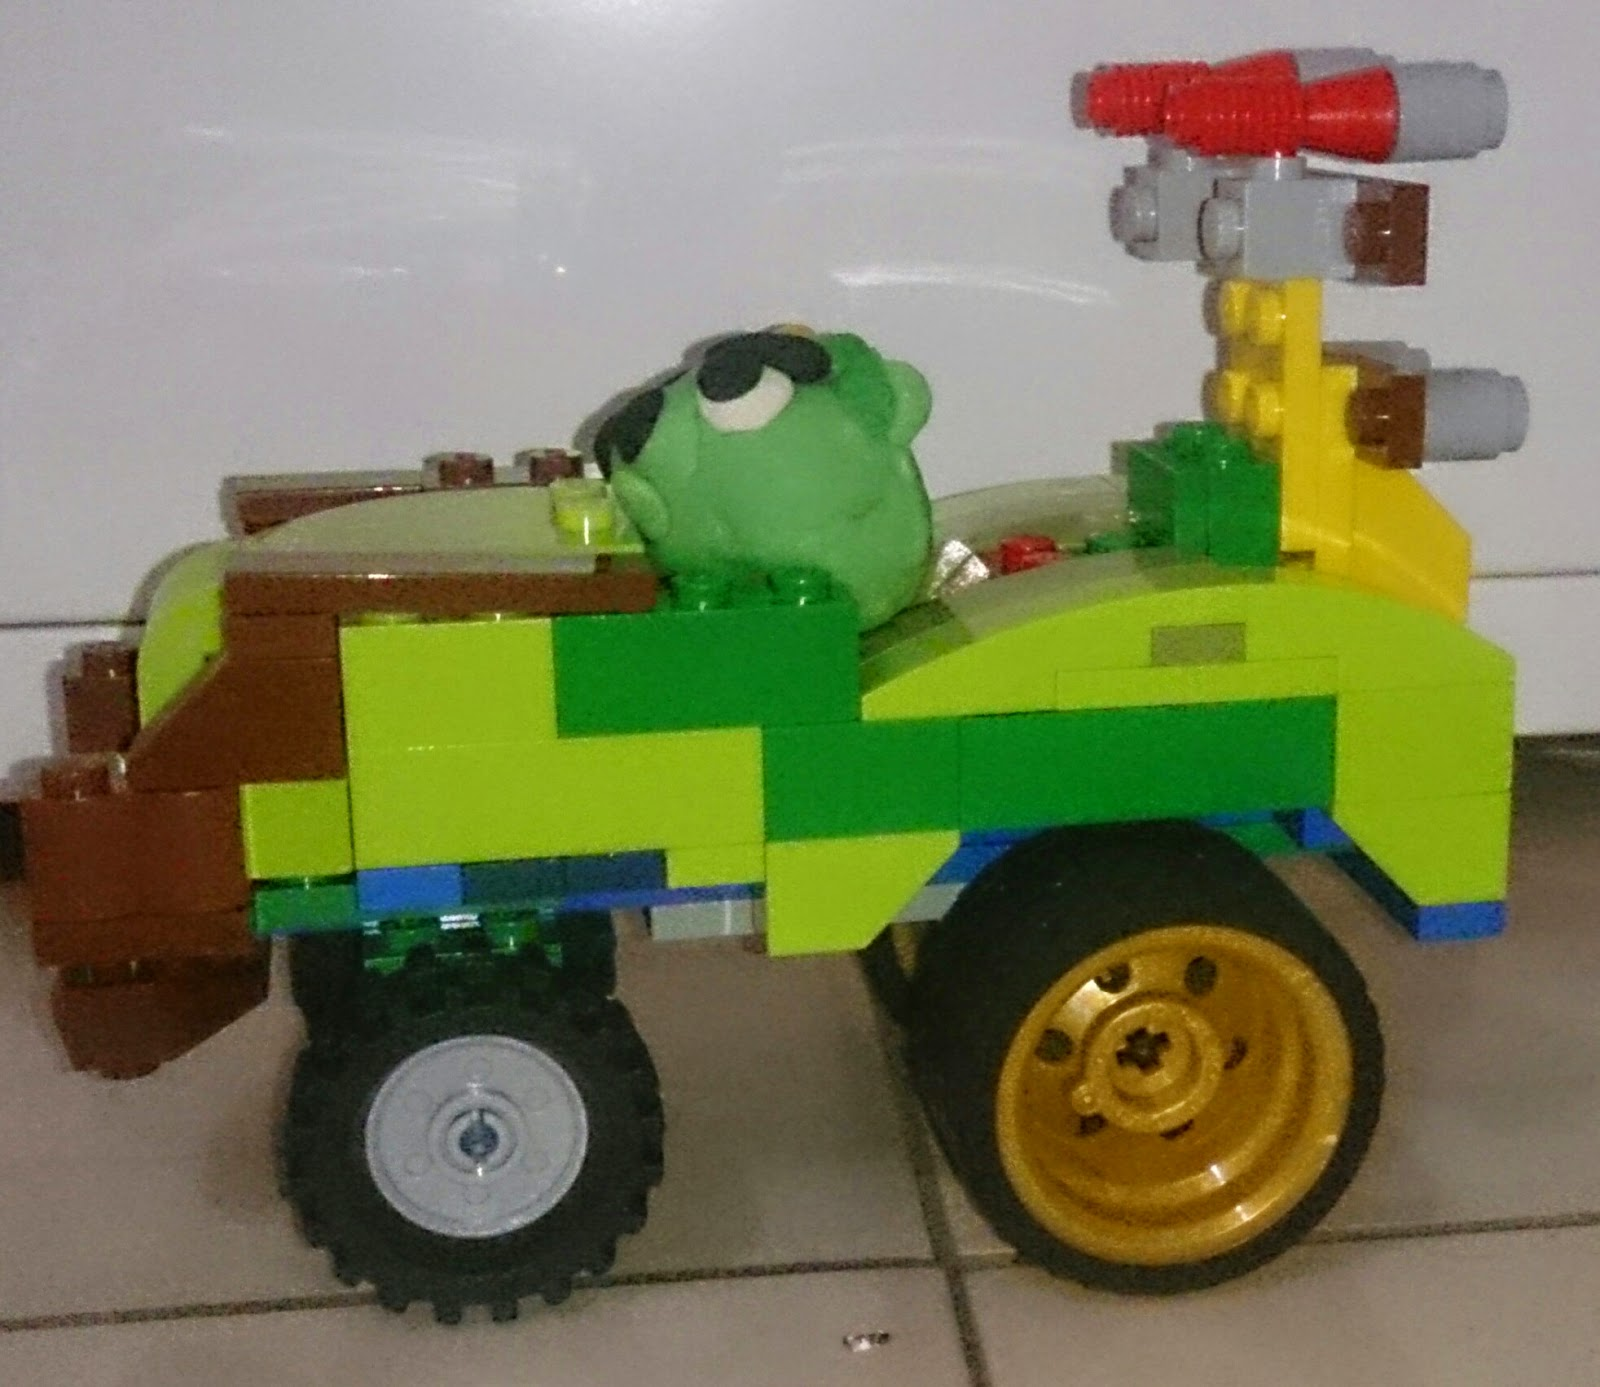 Ace Swan Blog: Lego Angry Birds Go MOC: Phoenix Star L6